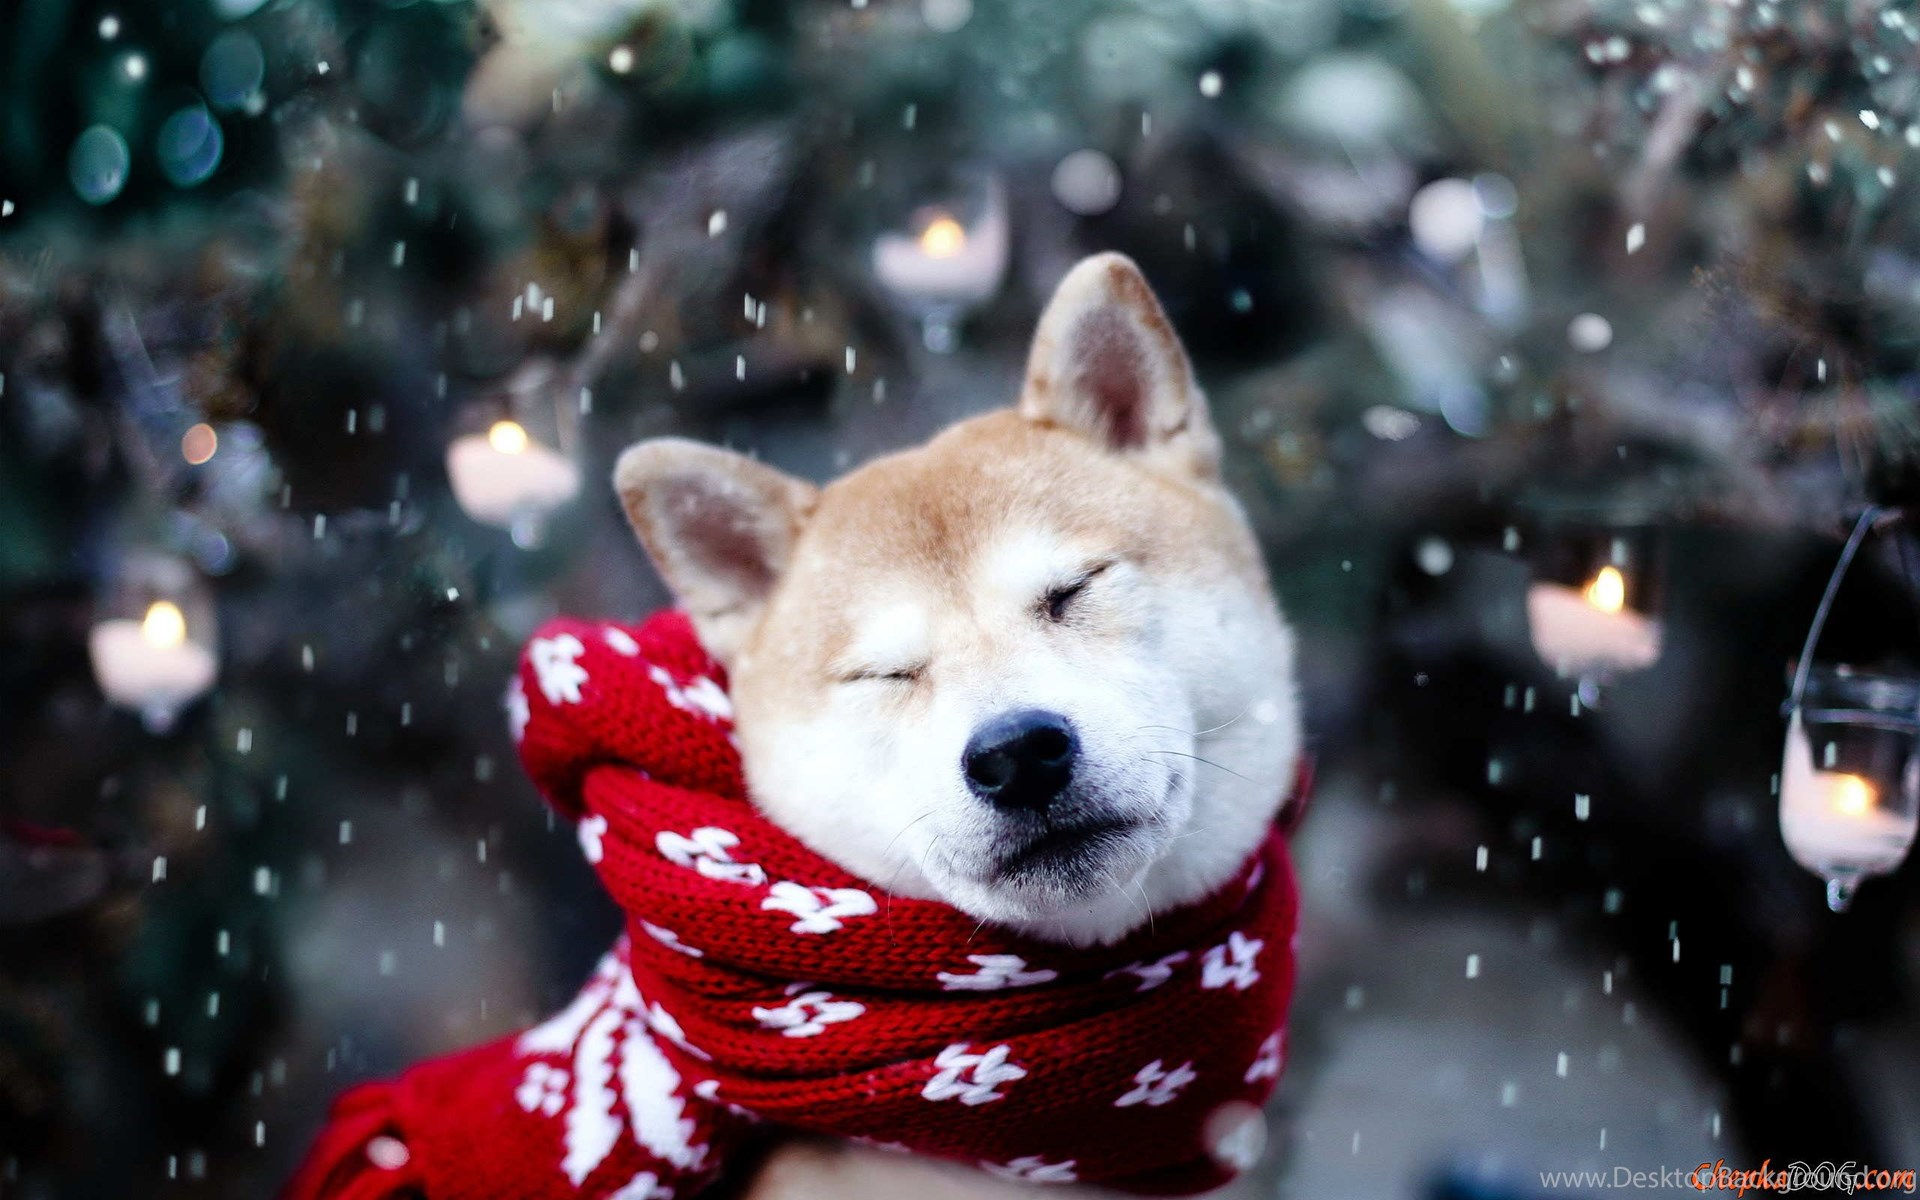 Dog Shiba Inu Wallpaper Dog Hd Wallpaper Shiba Inu Hd Wallpapers Desktop Background